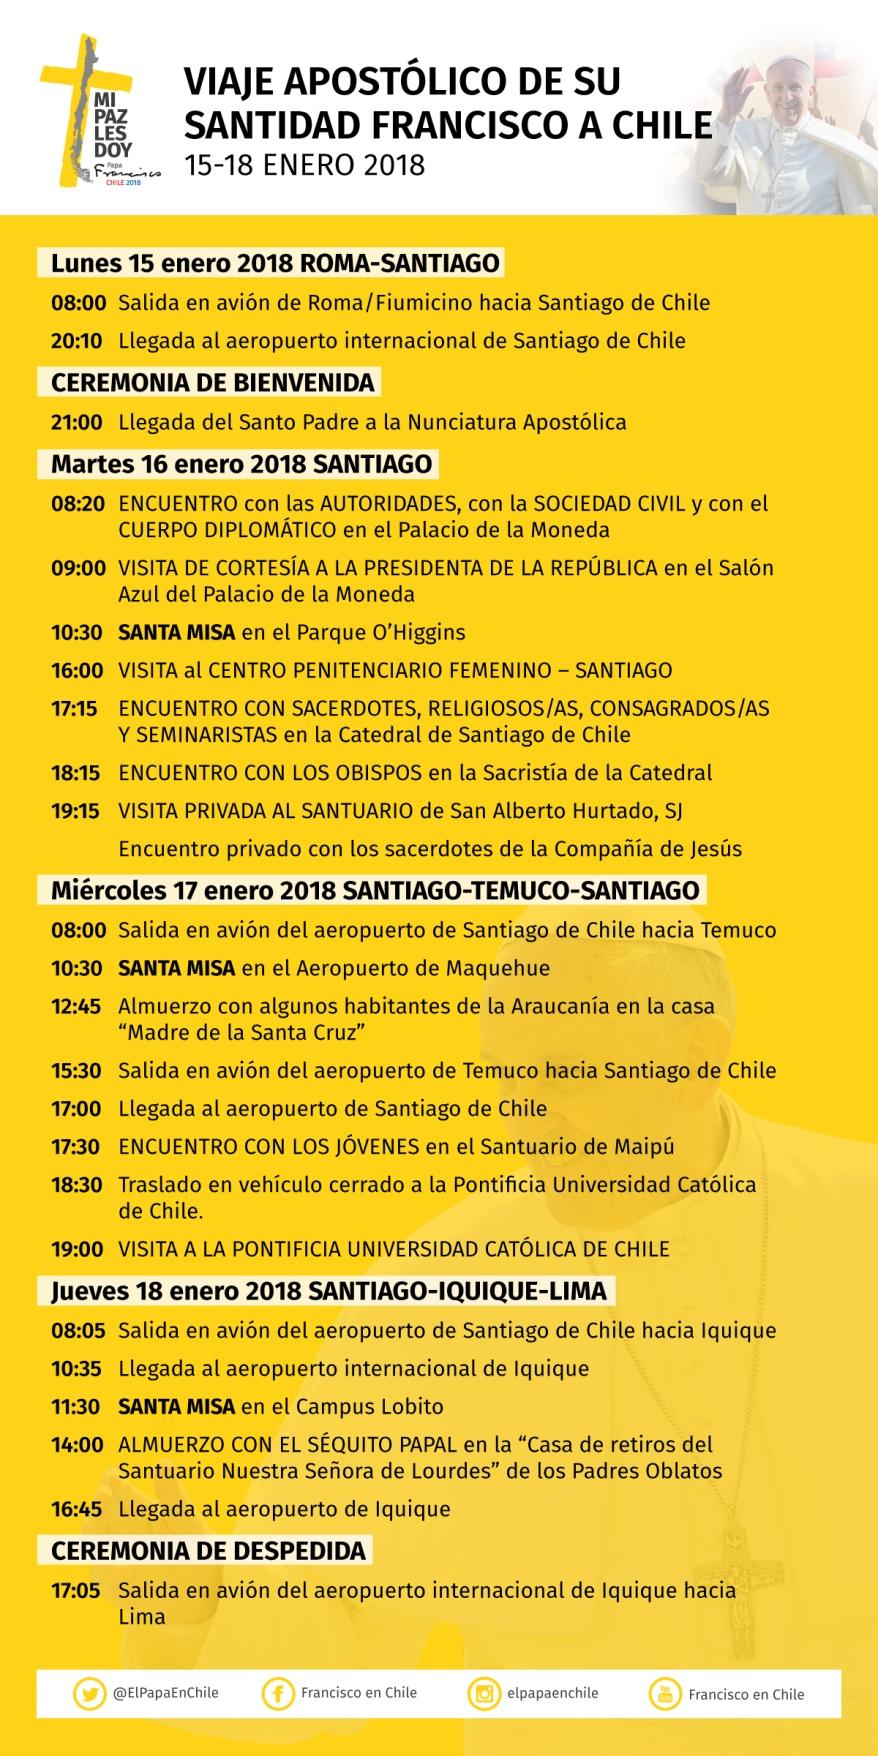 _Programa-Visita-Papa-Francisco-a-Chile